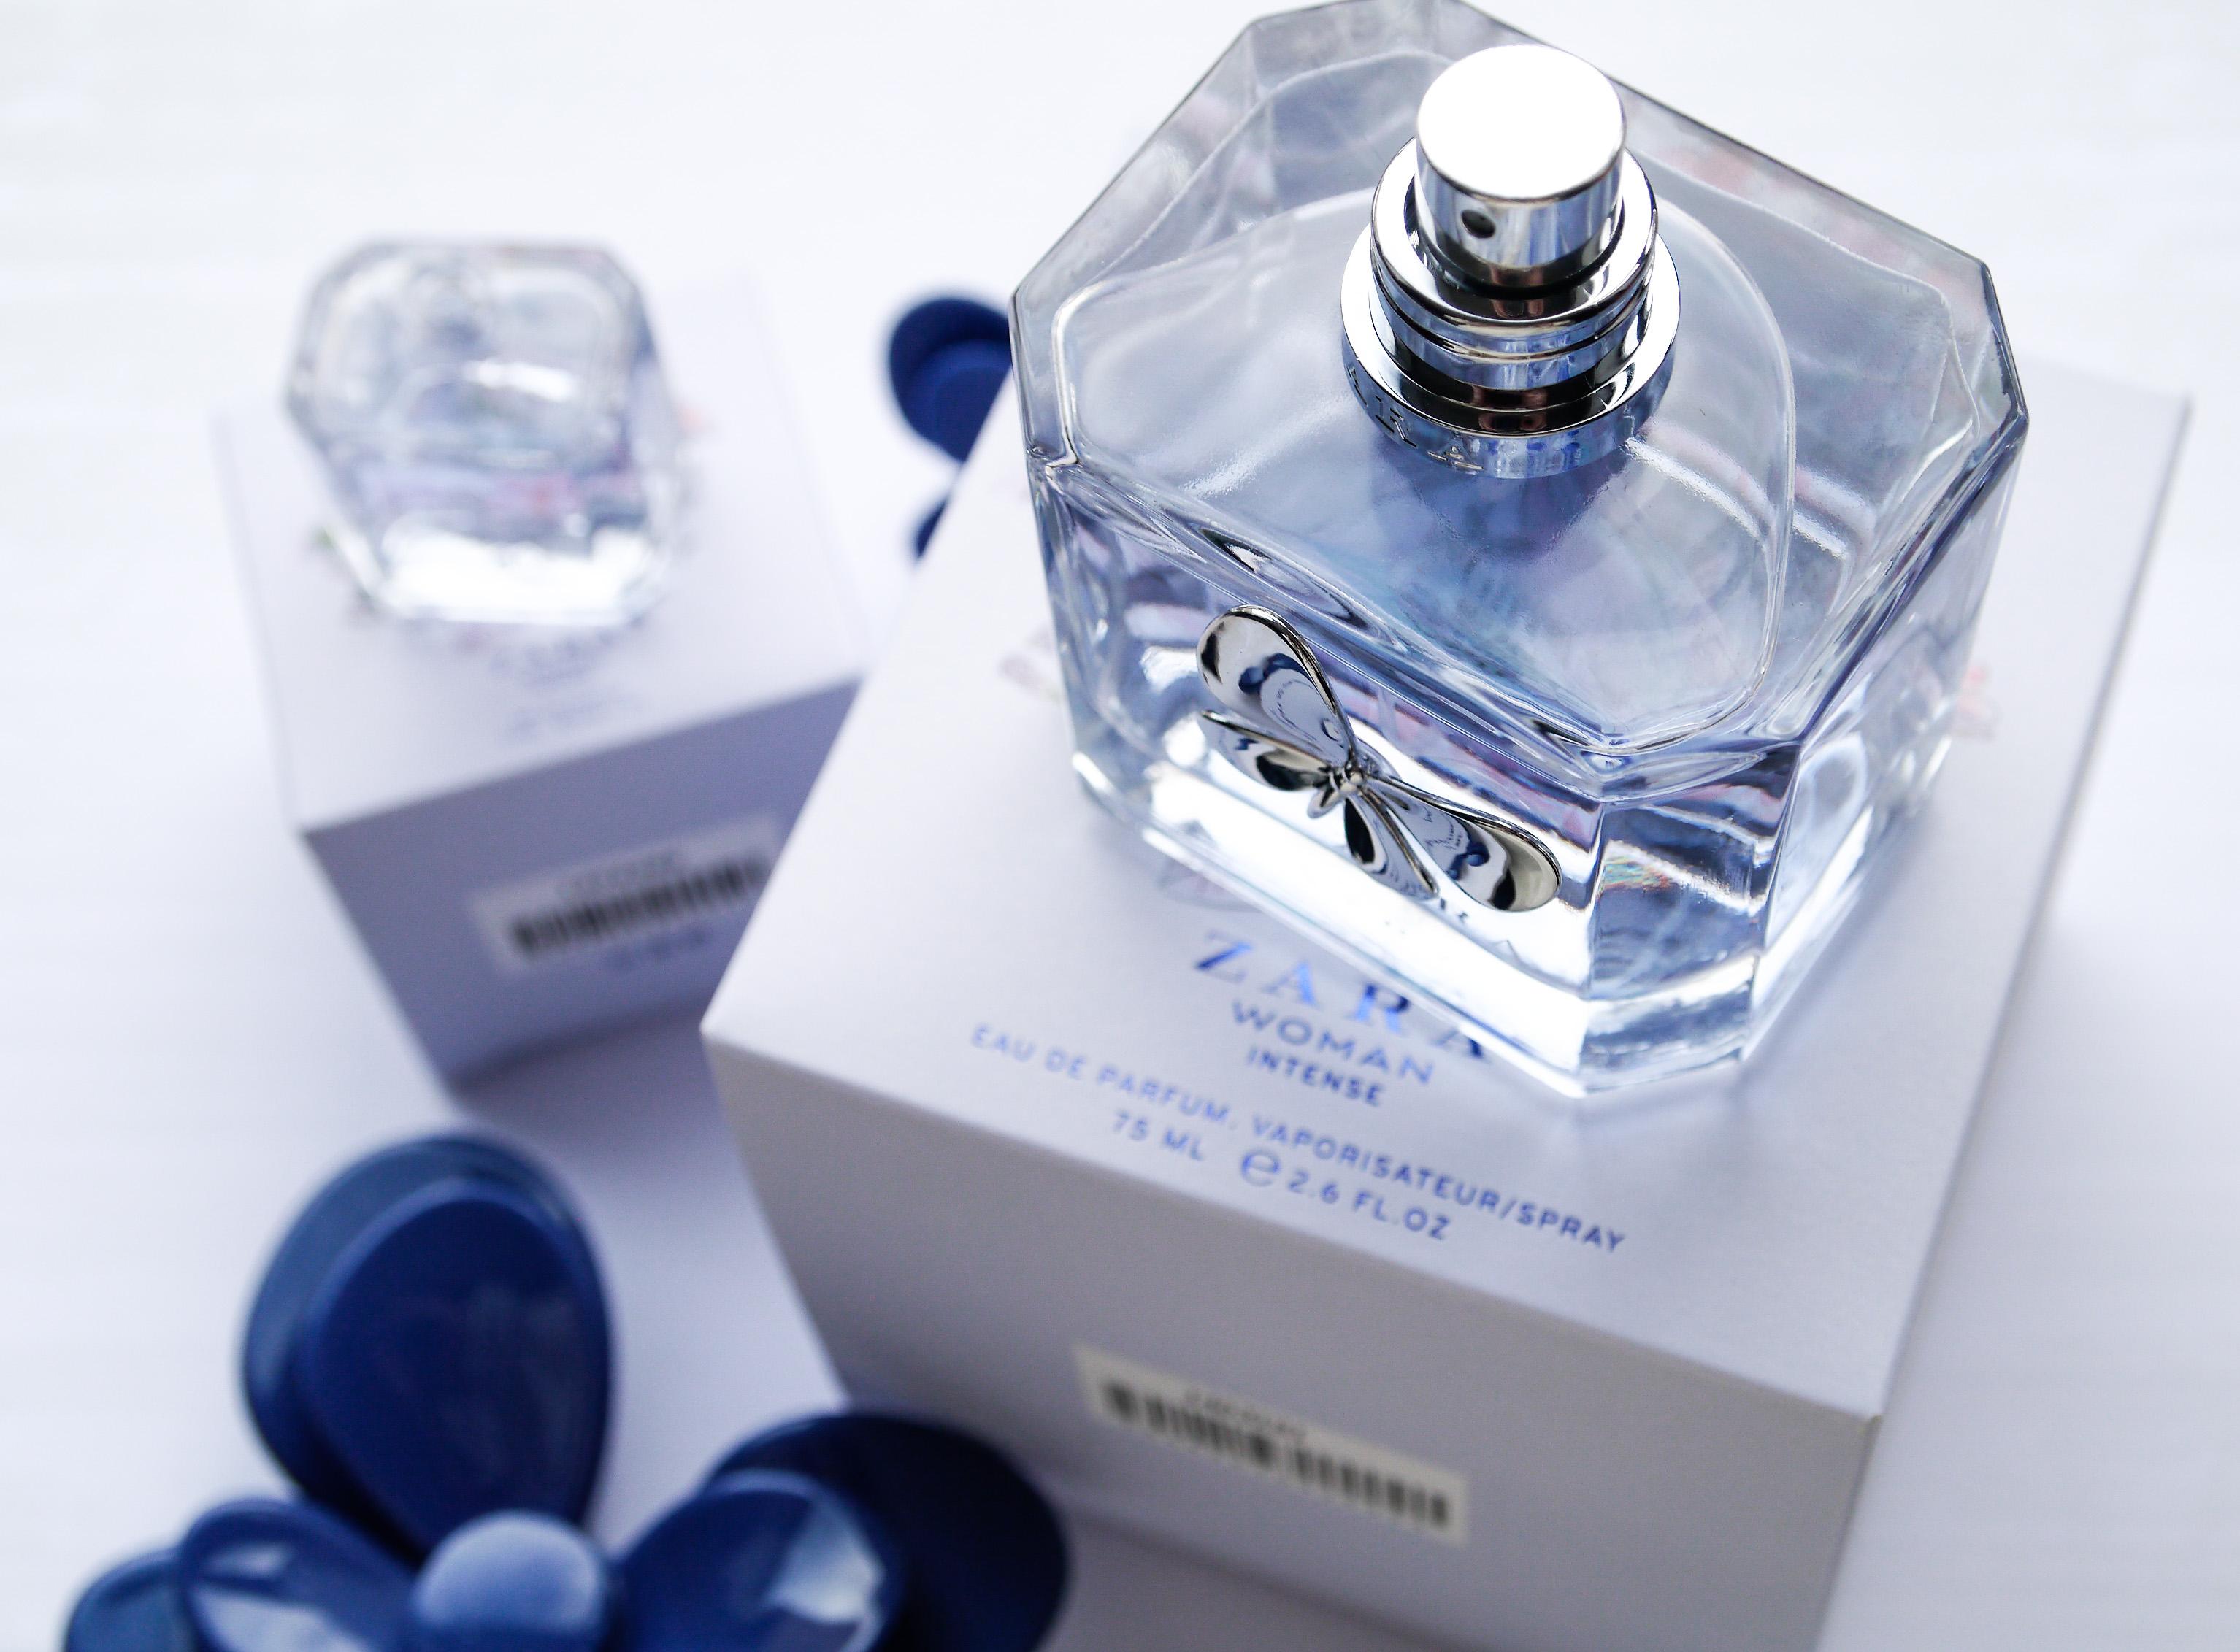 Zara De nl Budget KoopjeMevrouwmiauw Intense Eau Parfumlow CrtsQdxh